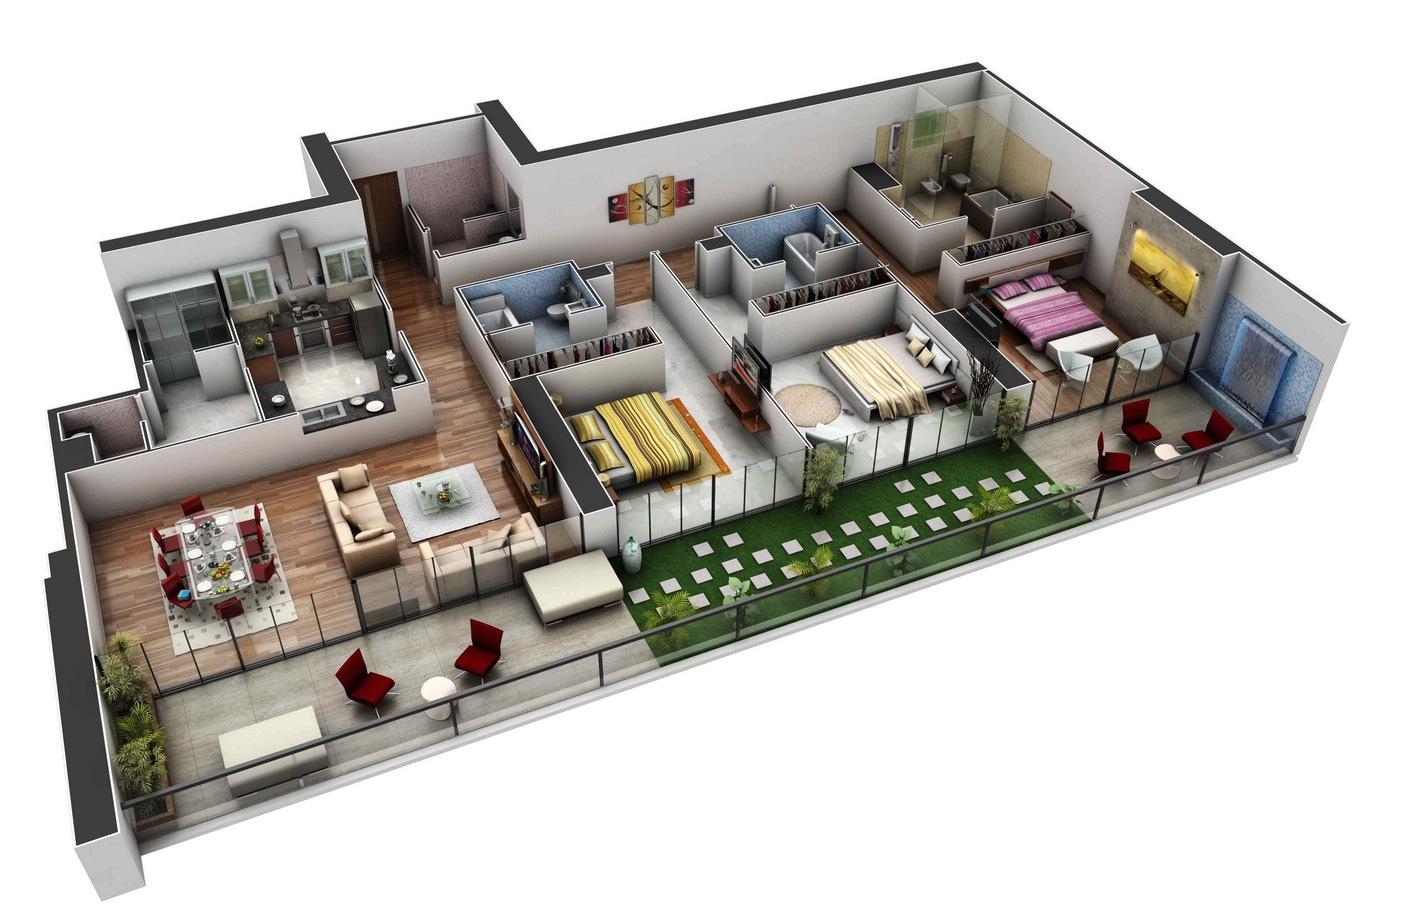 design perfect roommates bedroom house bedroom house floor plans bedroom bathroom house plans